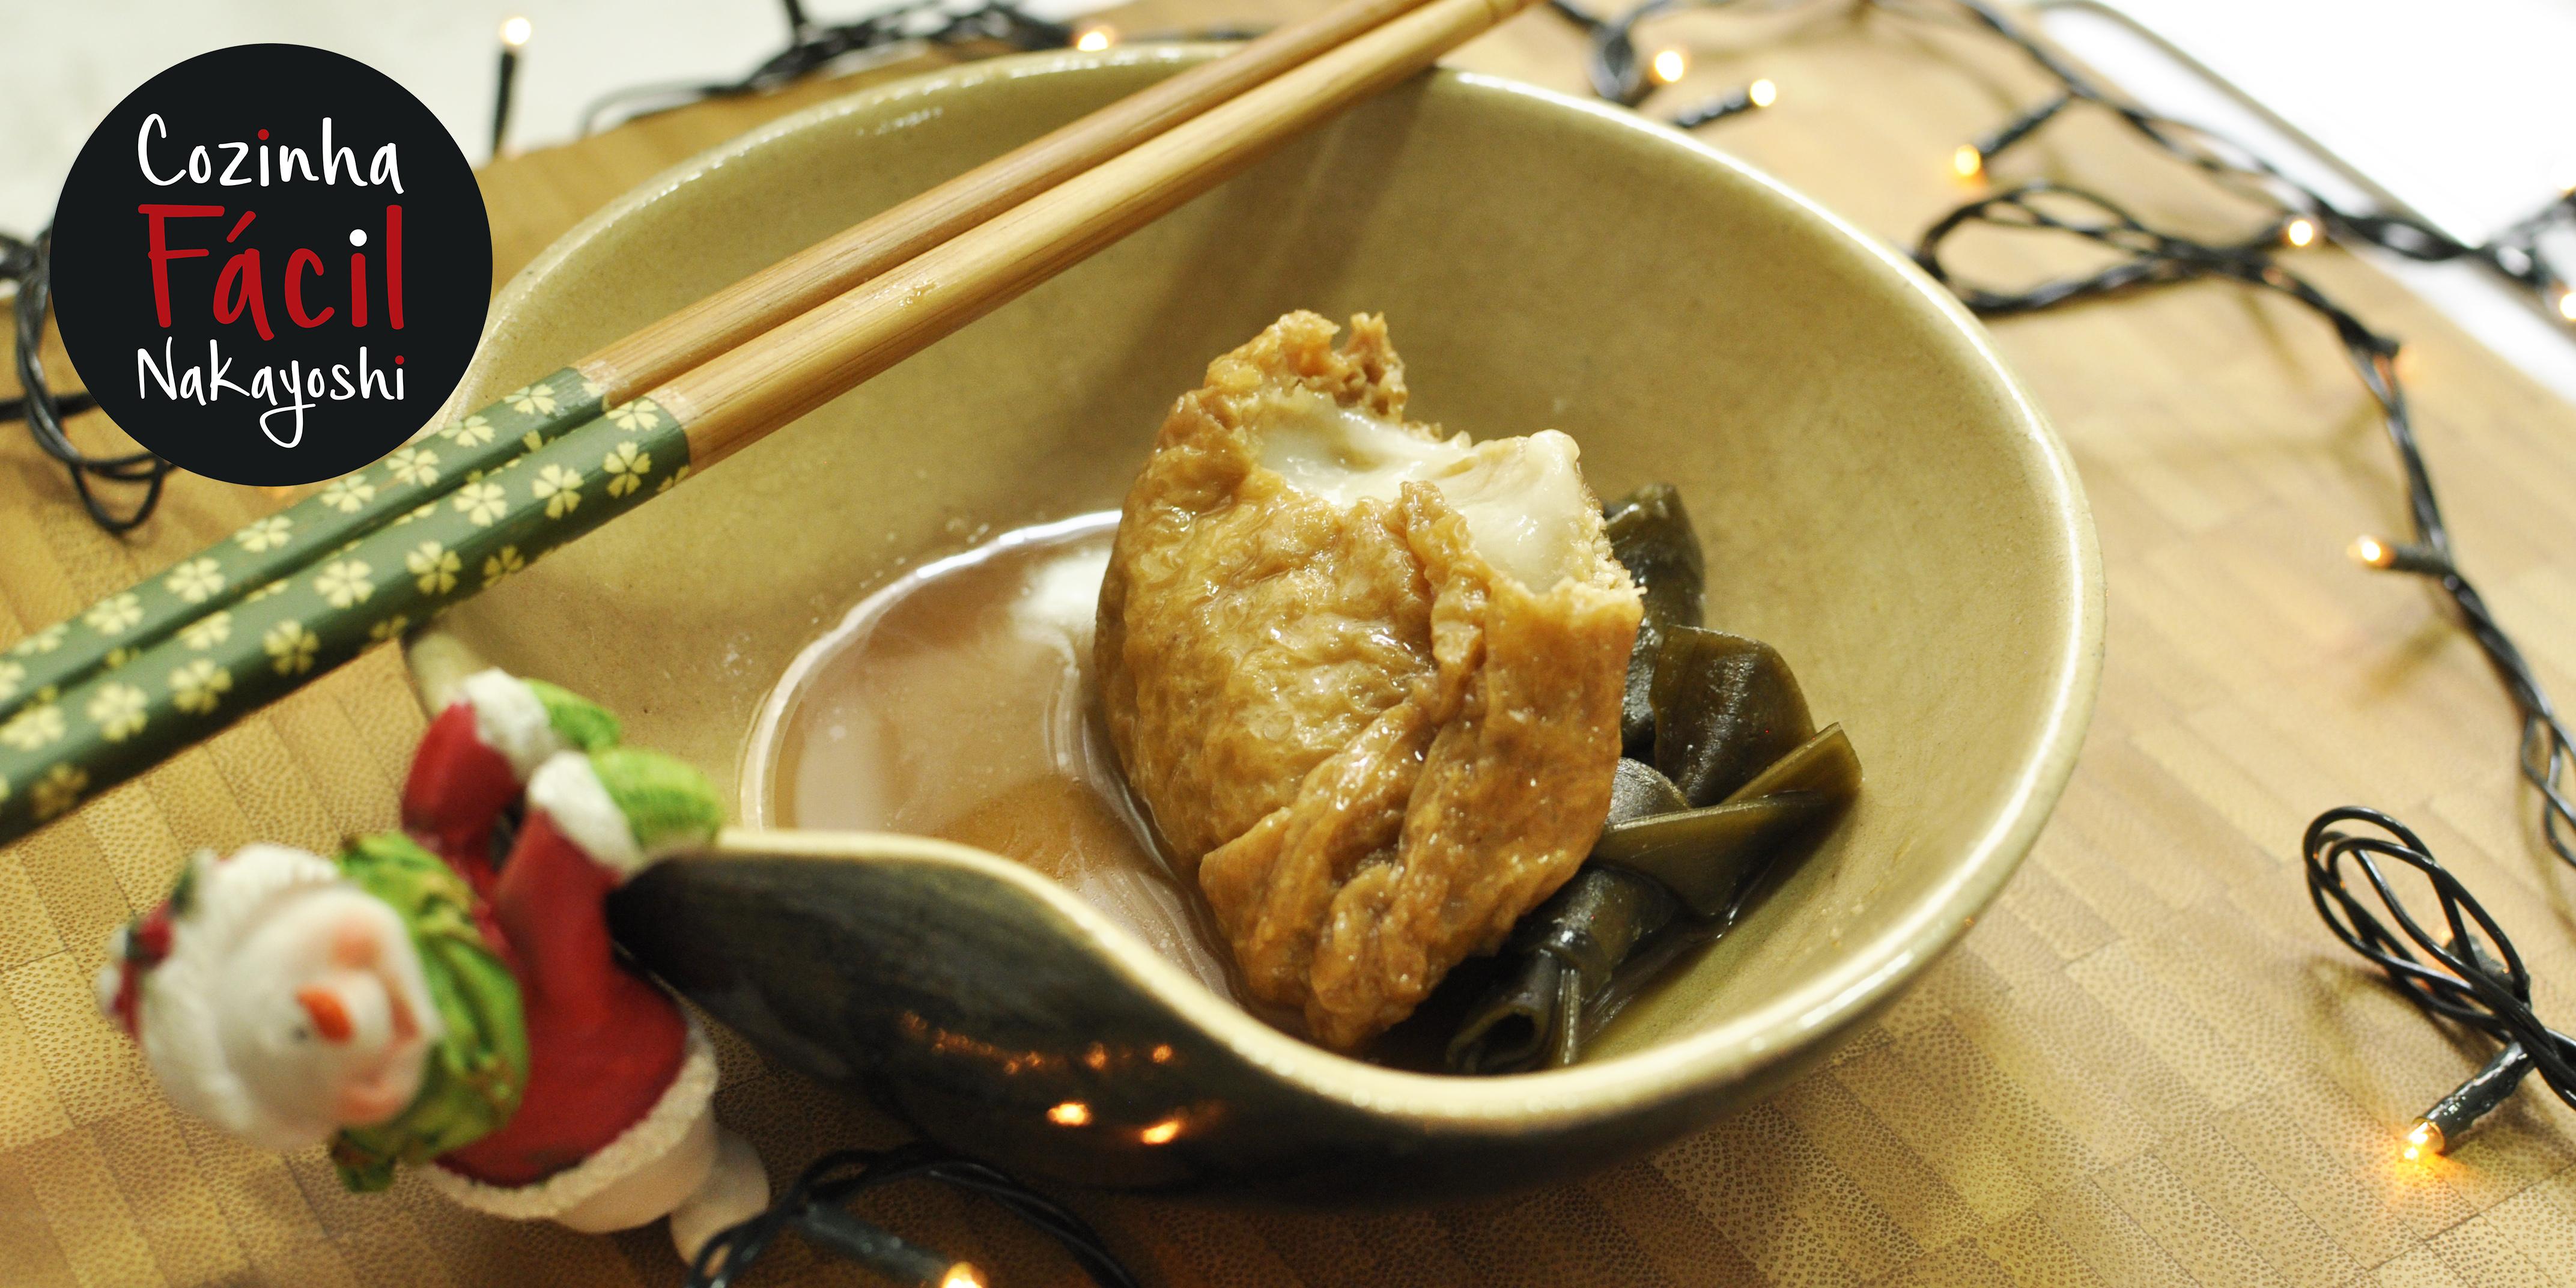 Kinchaku {saquinho da fortuna} | Cozinha Fácil Nakayoshi #18